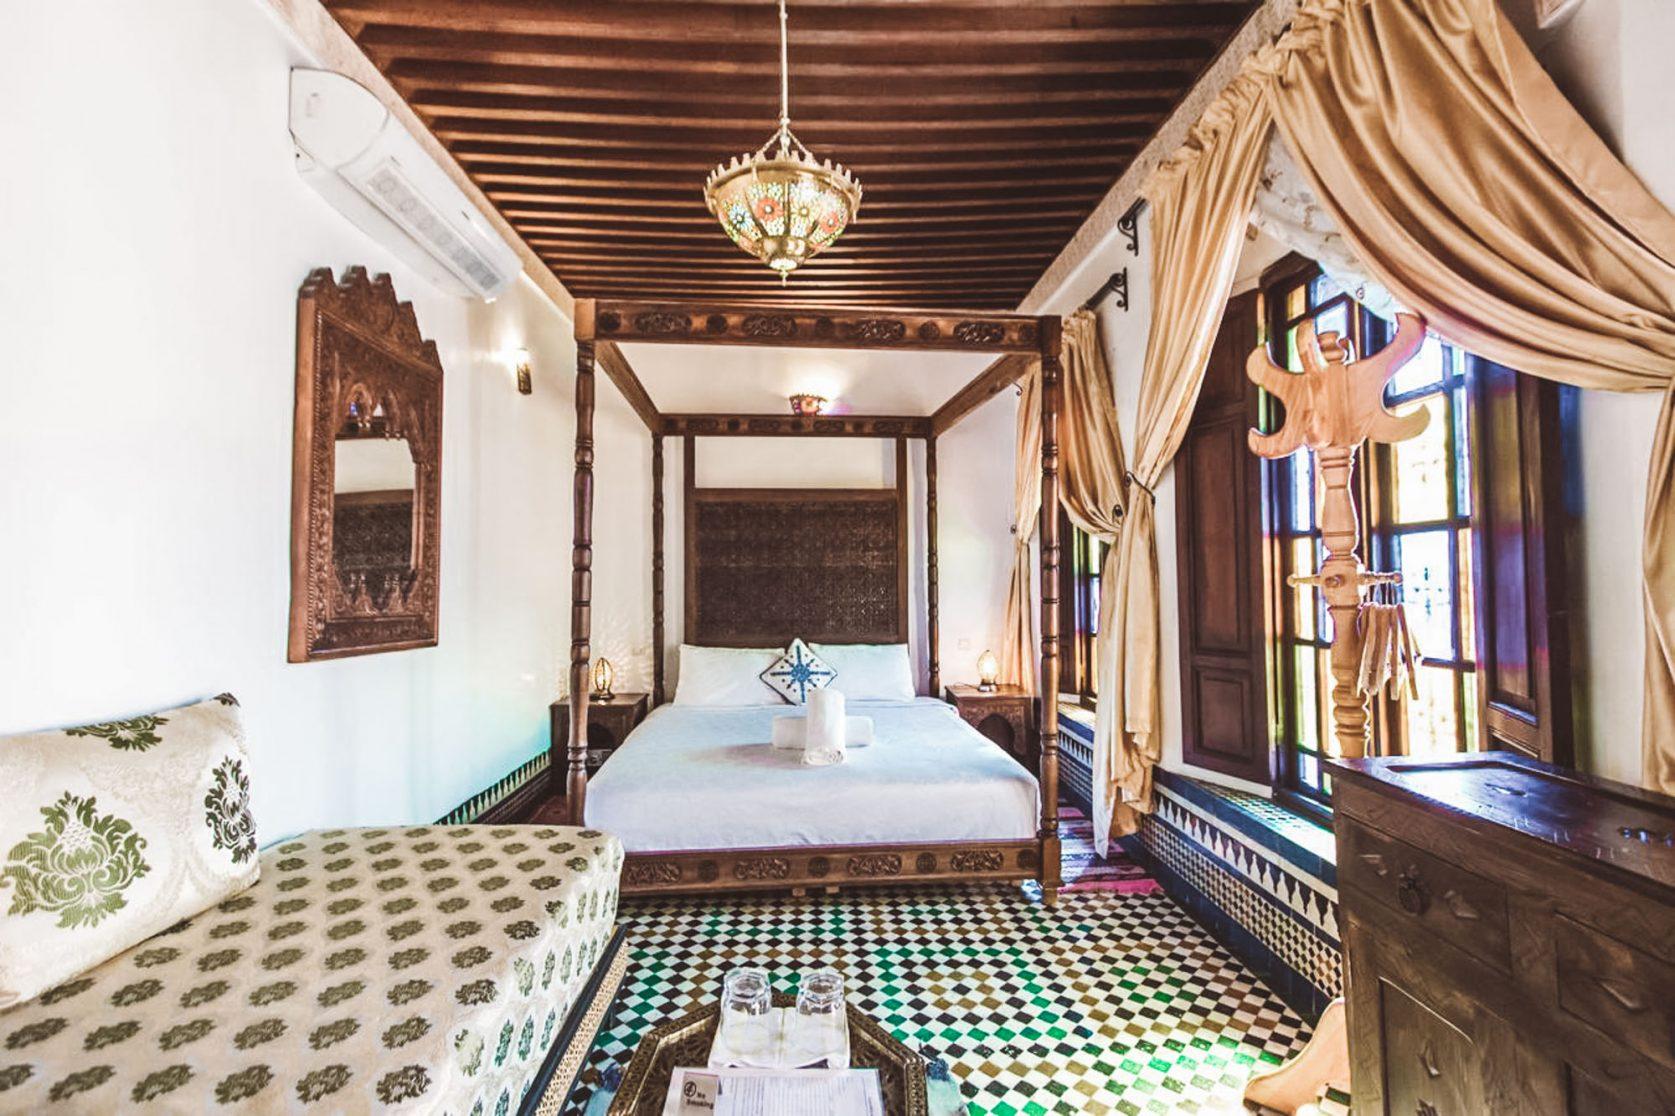 Excursión 4 días desde Fez al Desierto finalizando en Marrakech